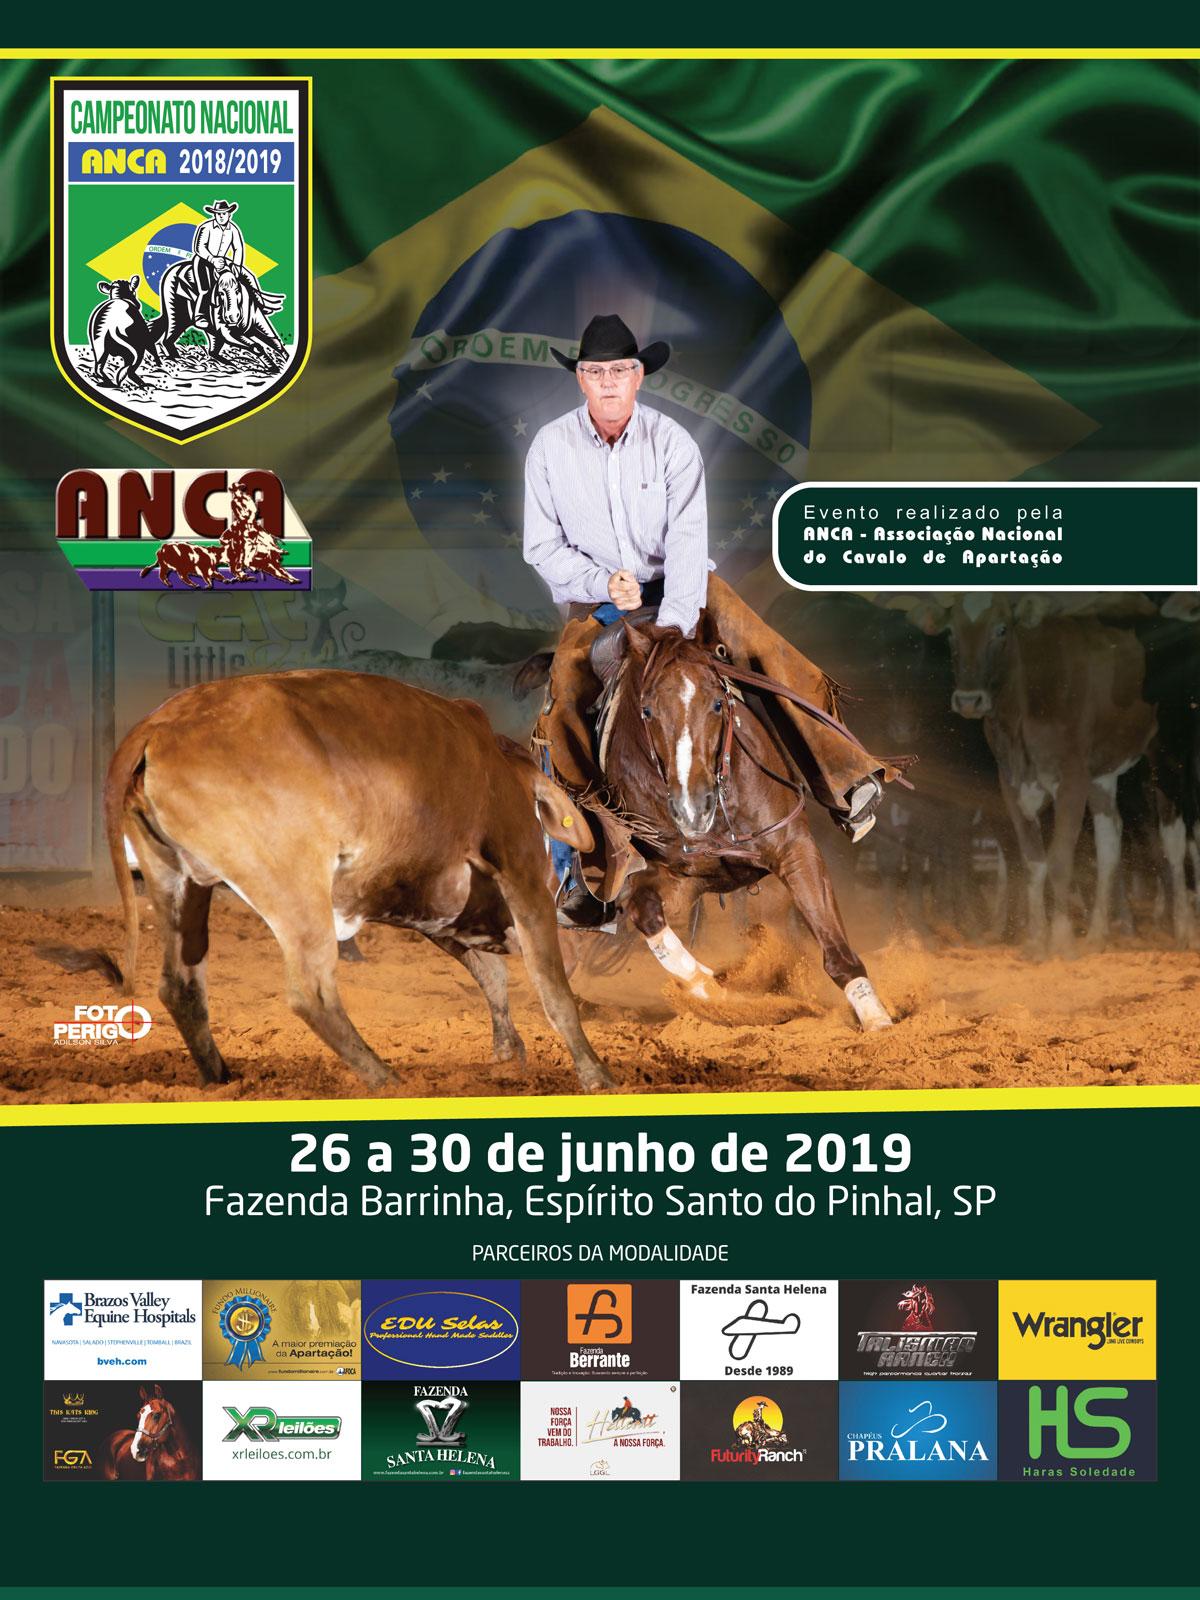 Campeonato Nacional ANCA 2018/2019